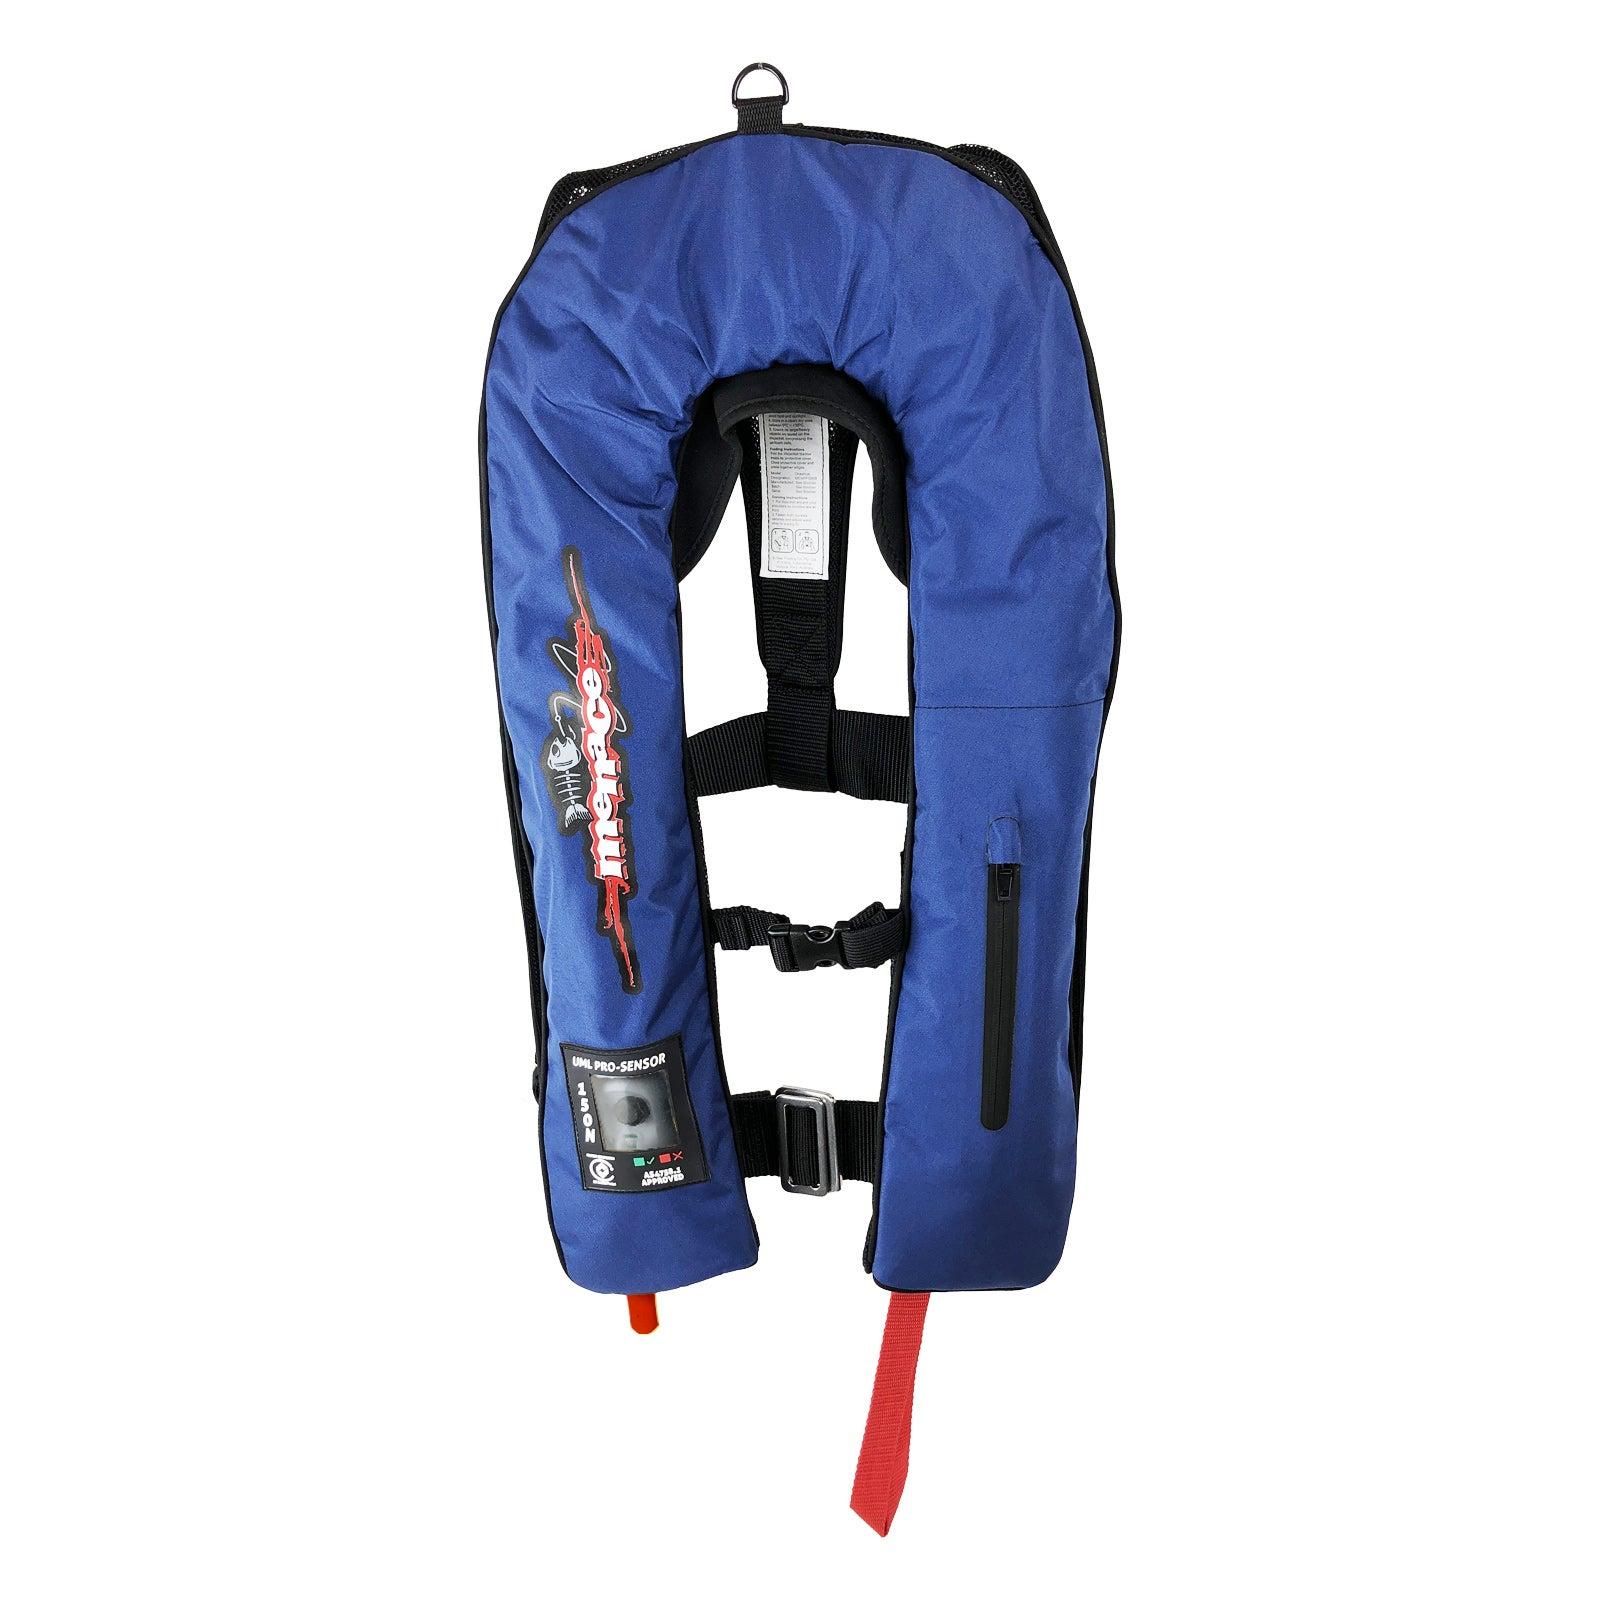 AUTOMATIC PRO Inflatable Life Jacket PFD Type 1 LifeJackets Level 150N